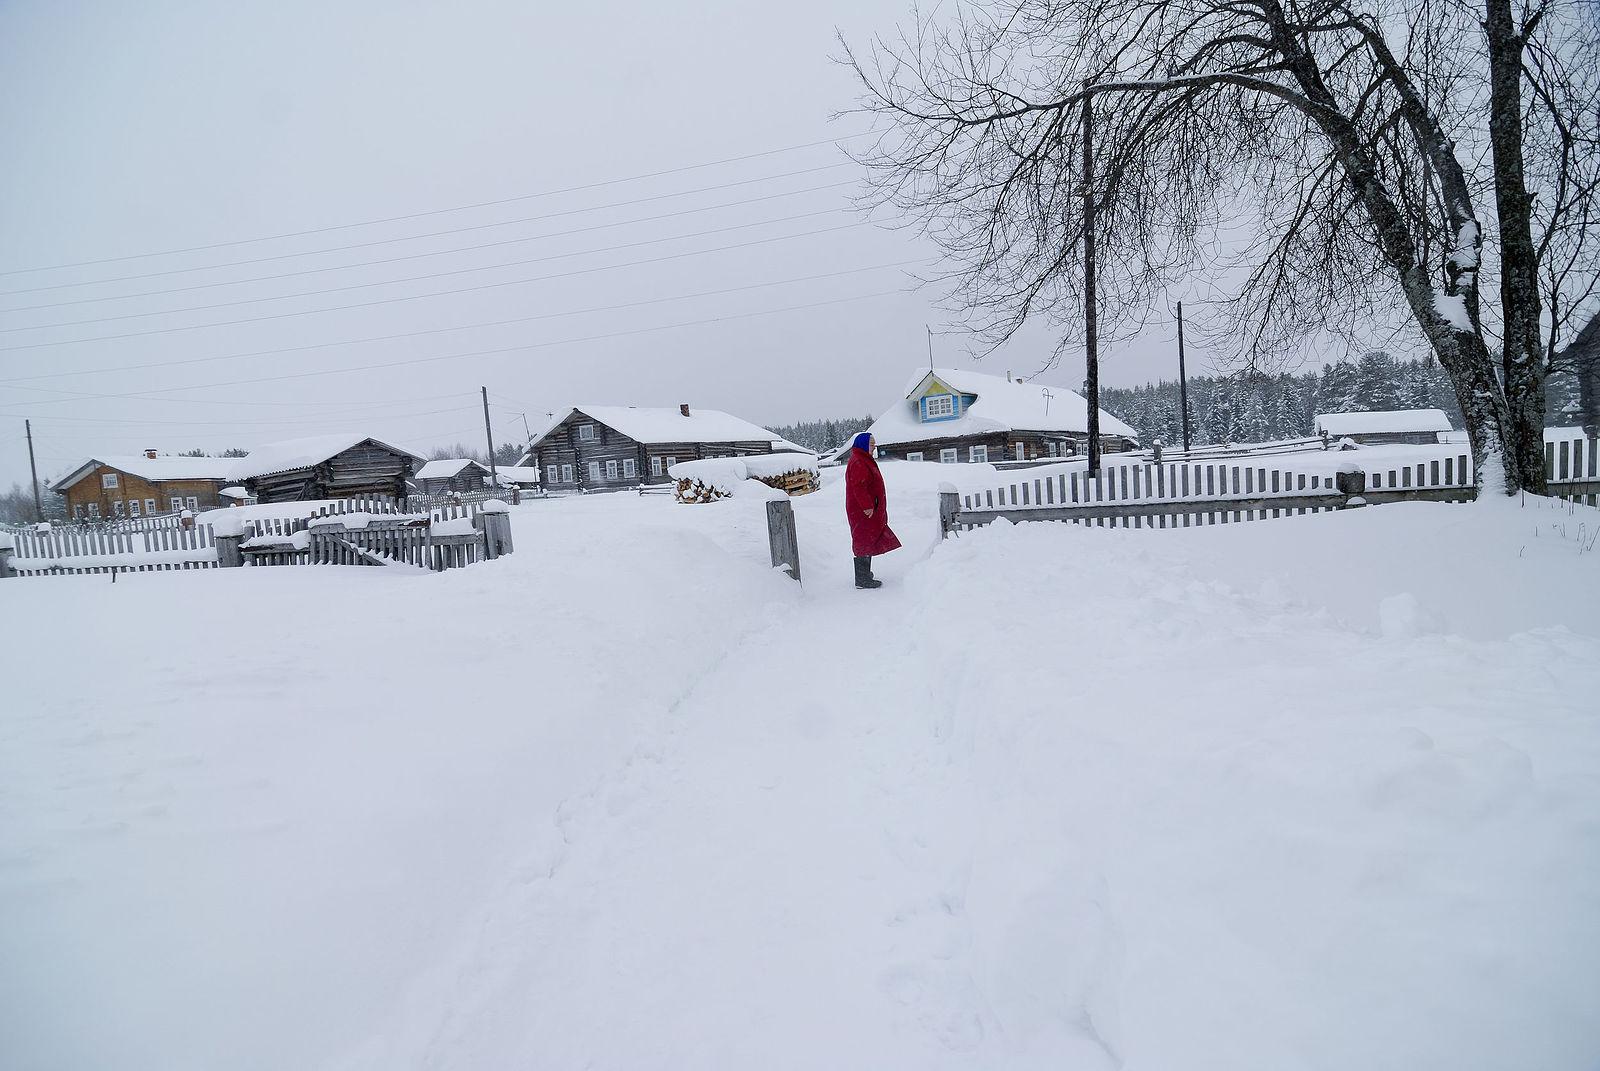 Arik Shraga. Neglected in the village. Rimma after snowstorm